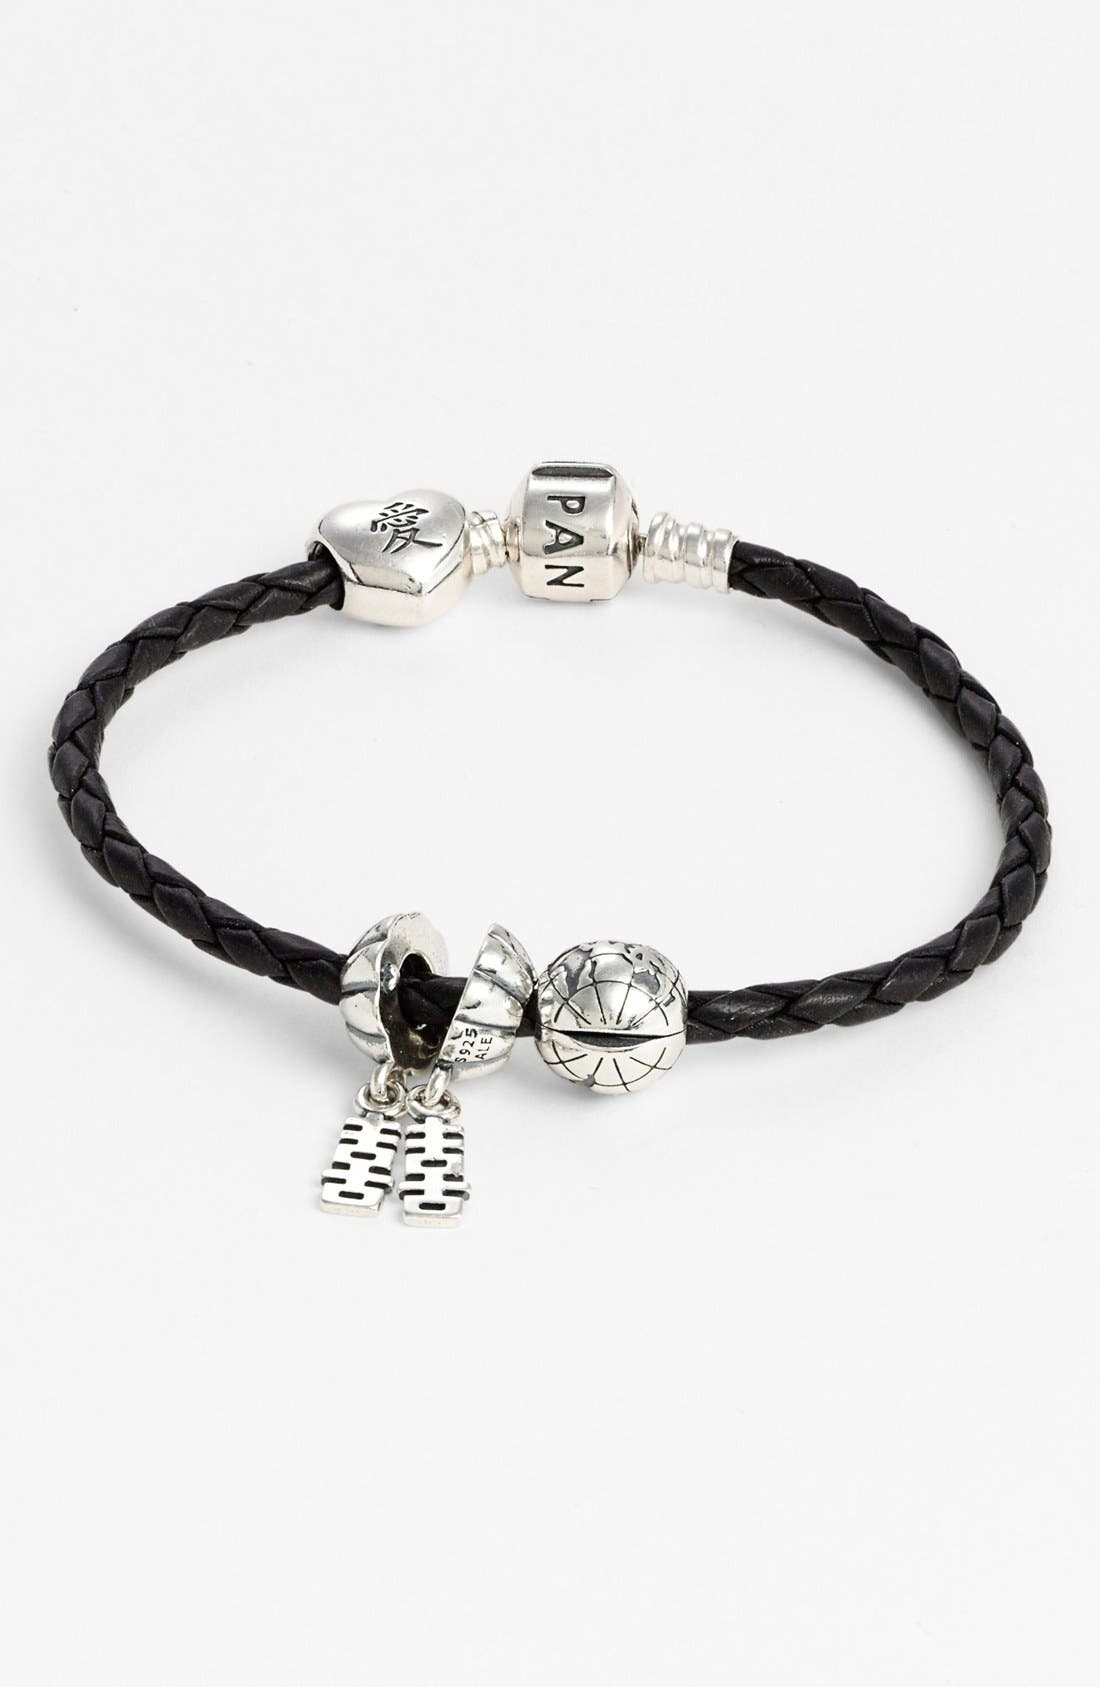 Alternate Image 1 Selected - PANDORA Leather Bracelet & Charms